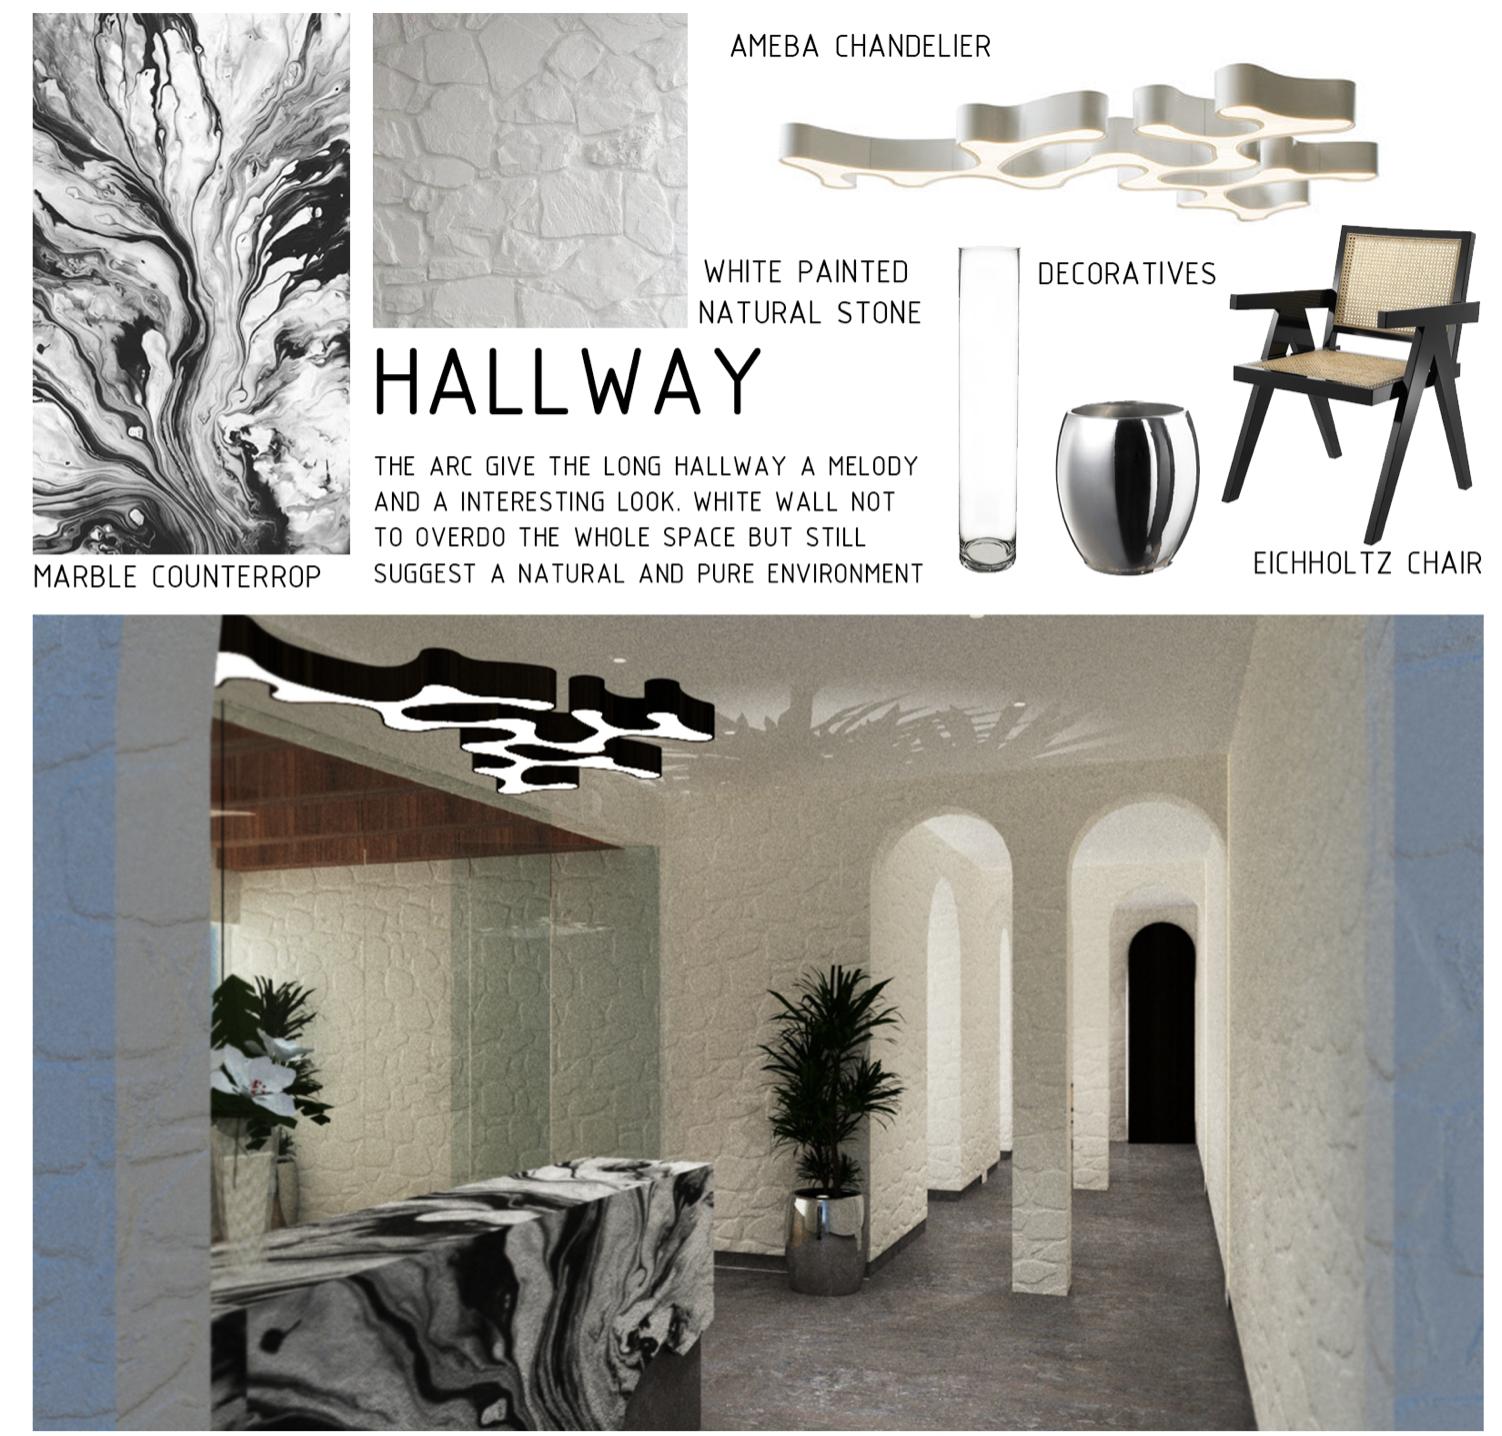 Winery Design | Sheridan College <br/><i>Khuong Dang</i>